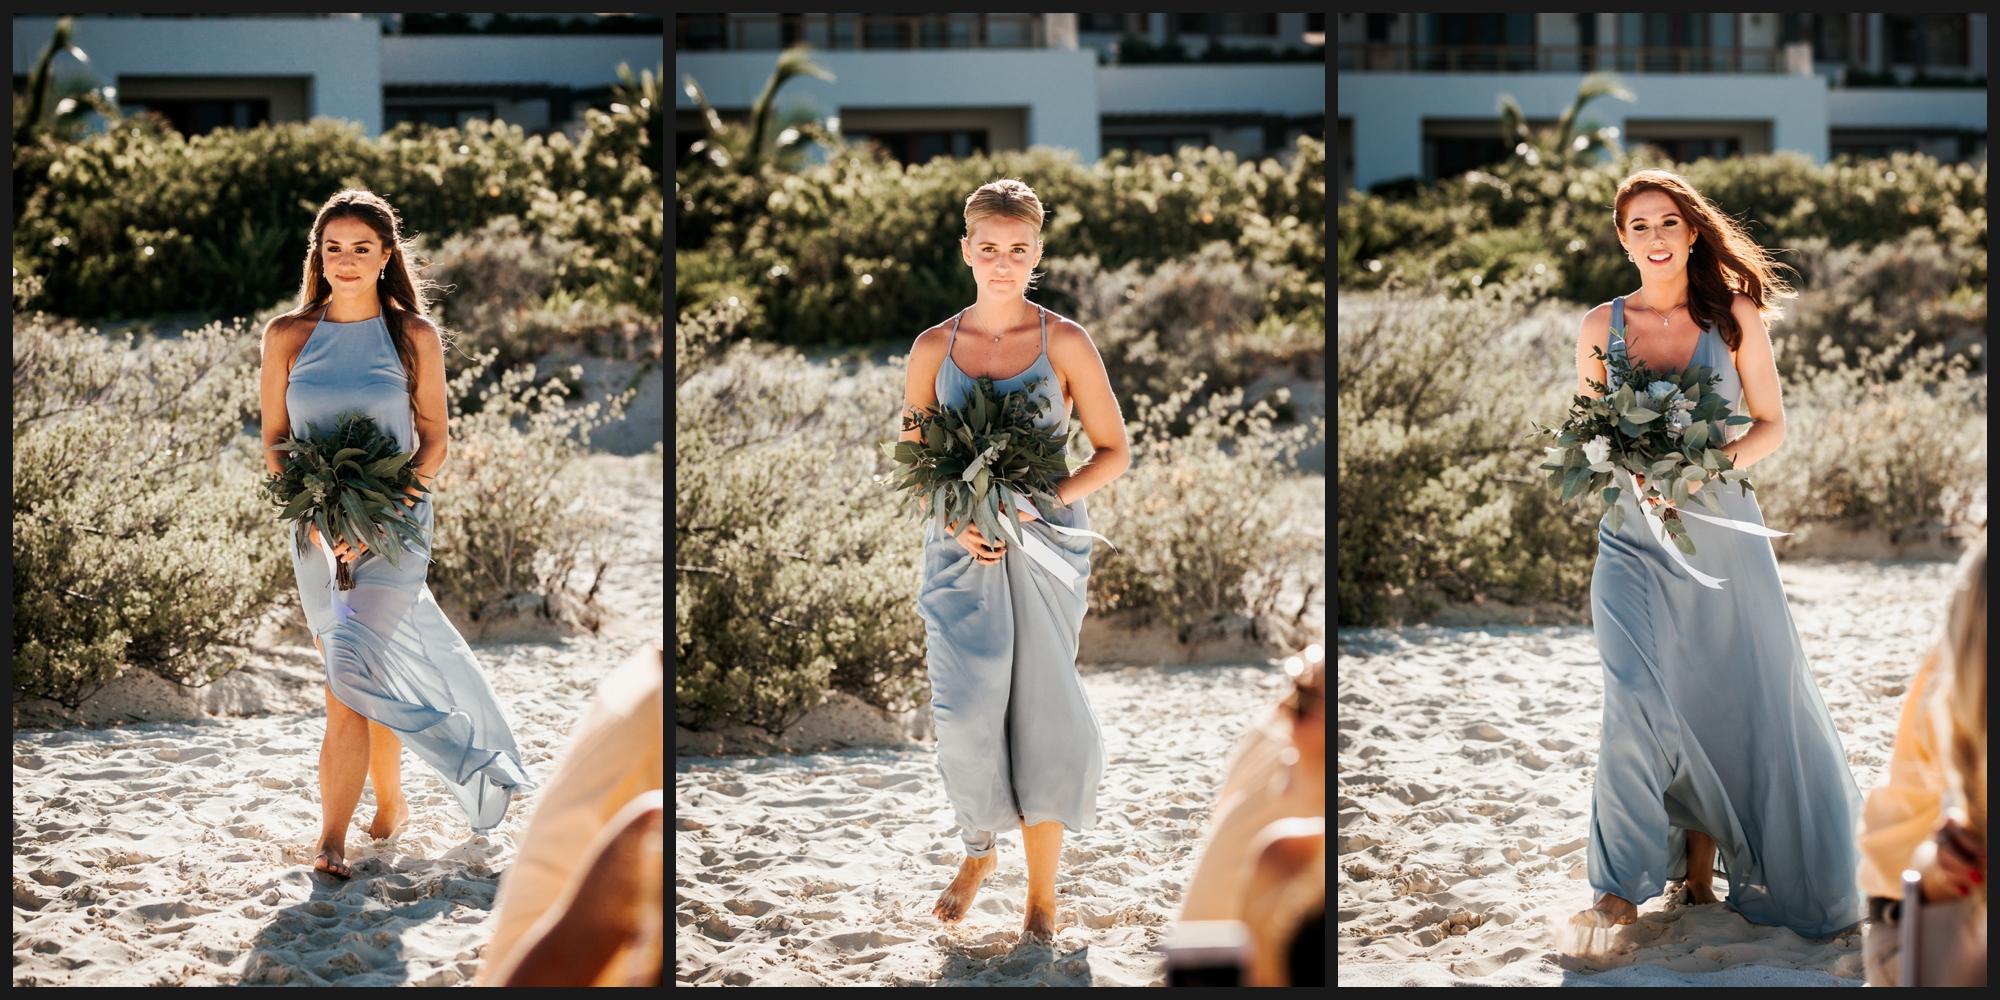 Orlando-Wedding-Photographer-destination-wedding-photographer-florida-wedding-photographer-bohemian-wedding-photographer_0464.jpg